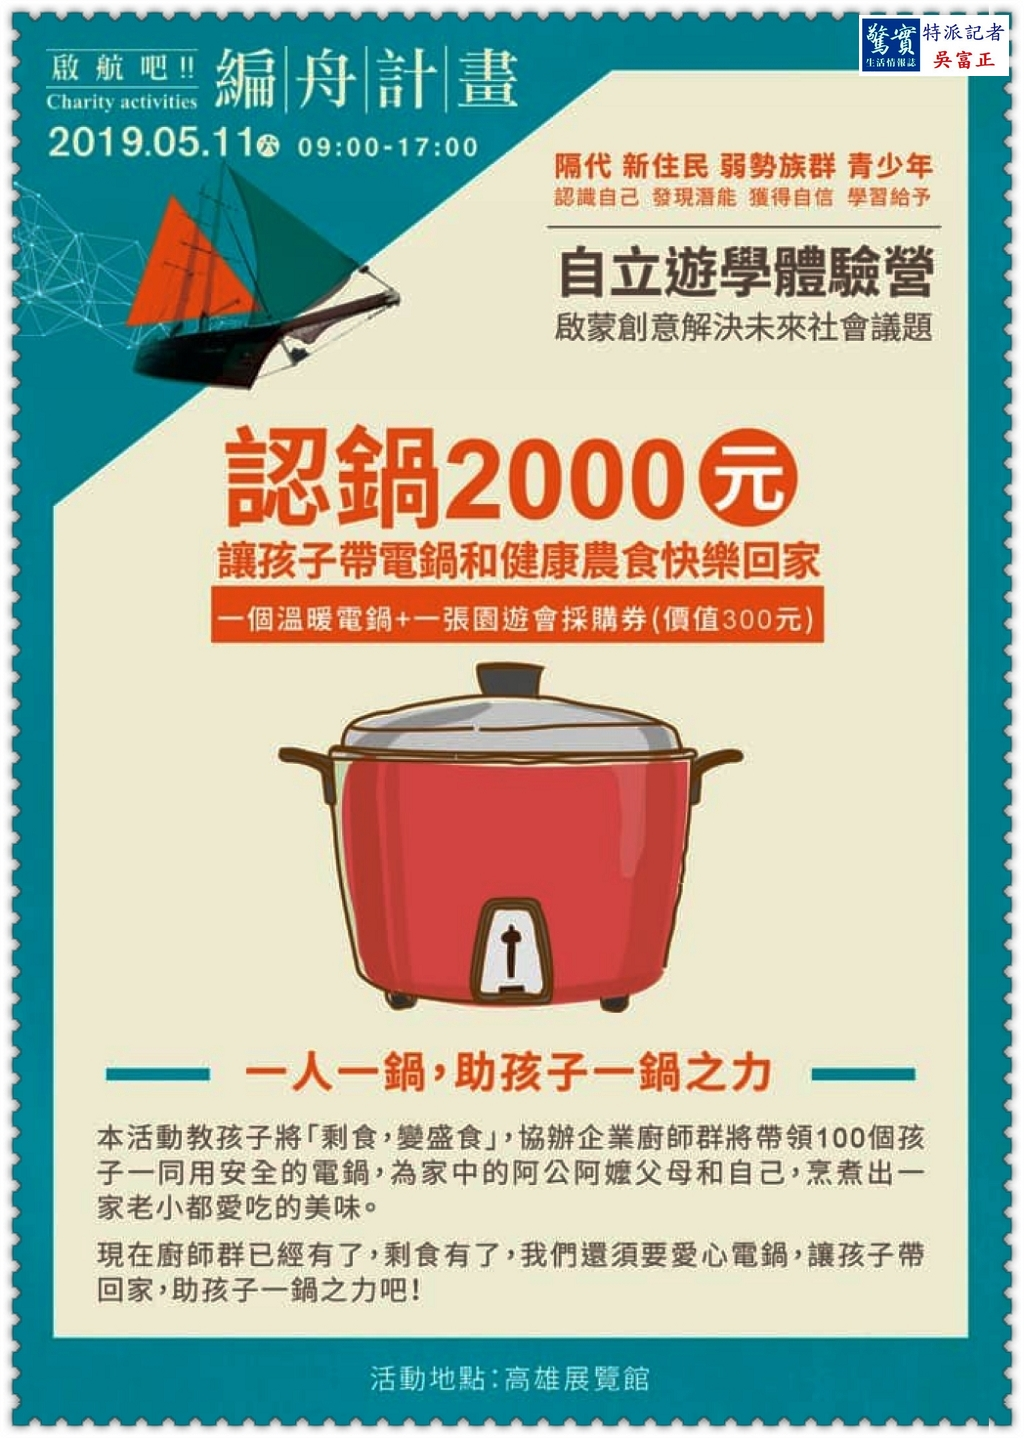 20190503C(驚實報)-編舟計畫讓弱勢孩子啟發天賦03